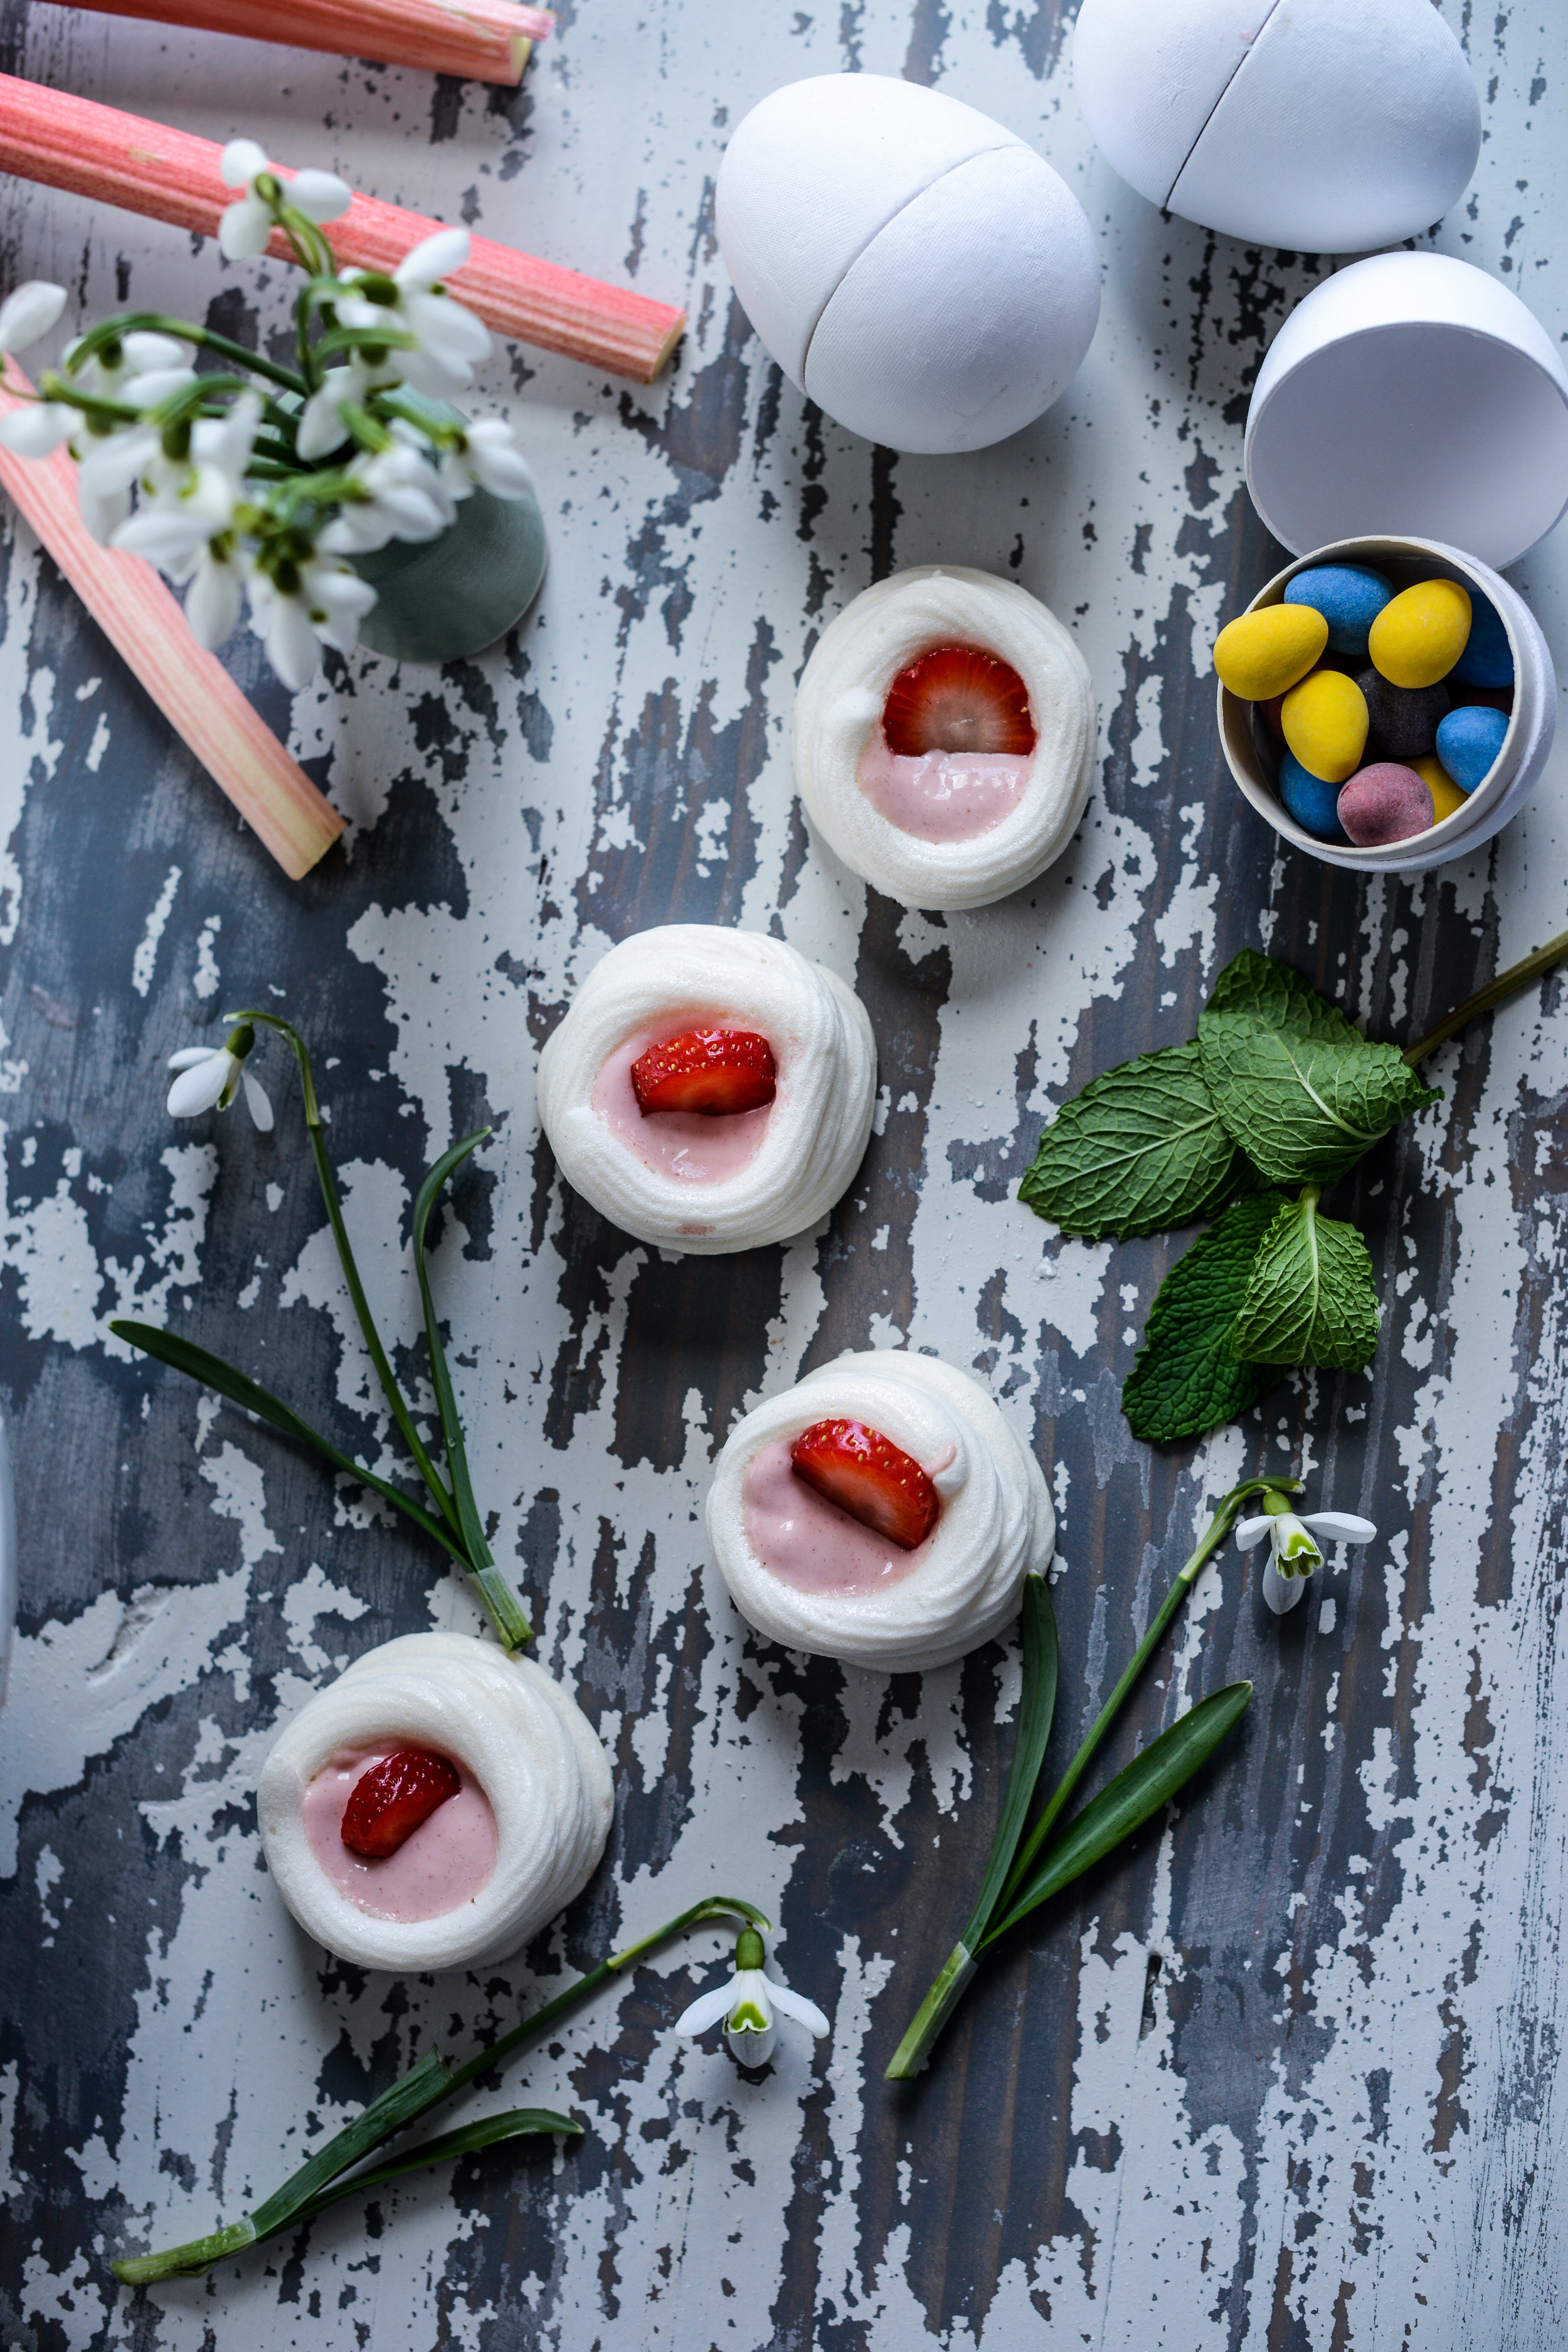 Fare Isle | Vegan Aquafaba Meringue and Rhubarb Curd Easter Cake (Pavlova)